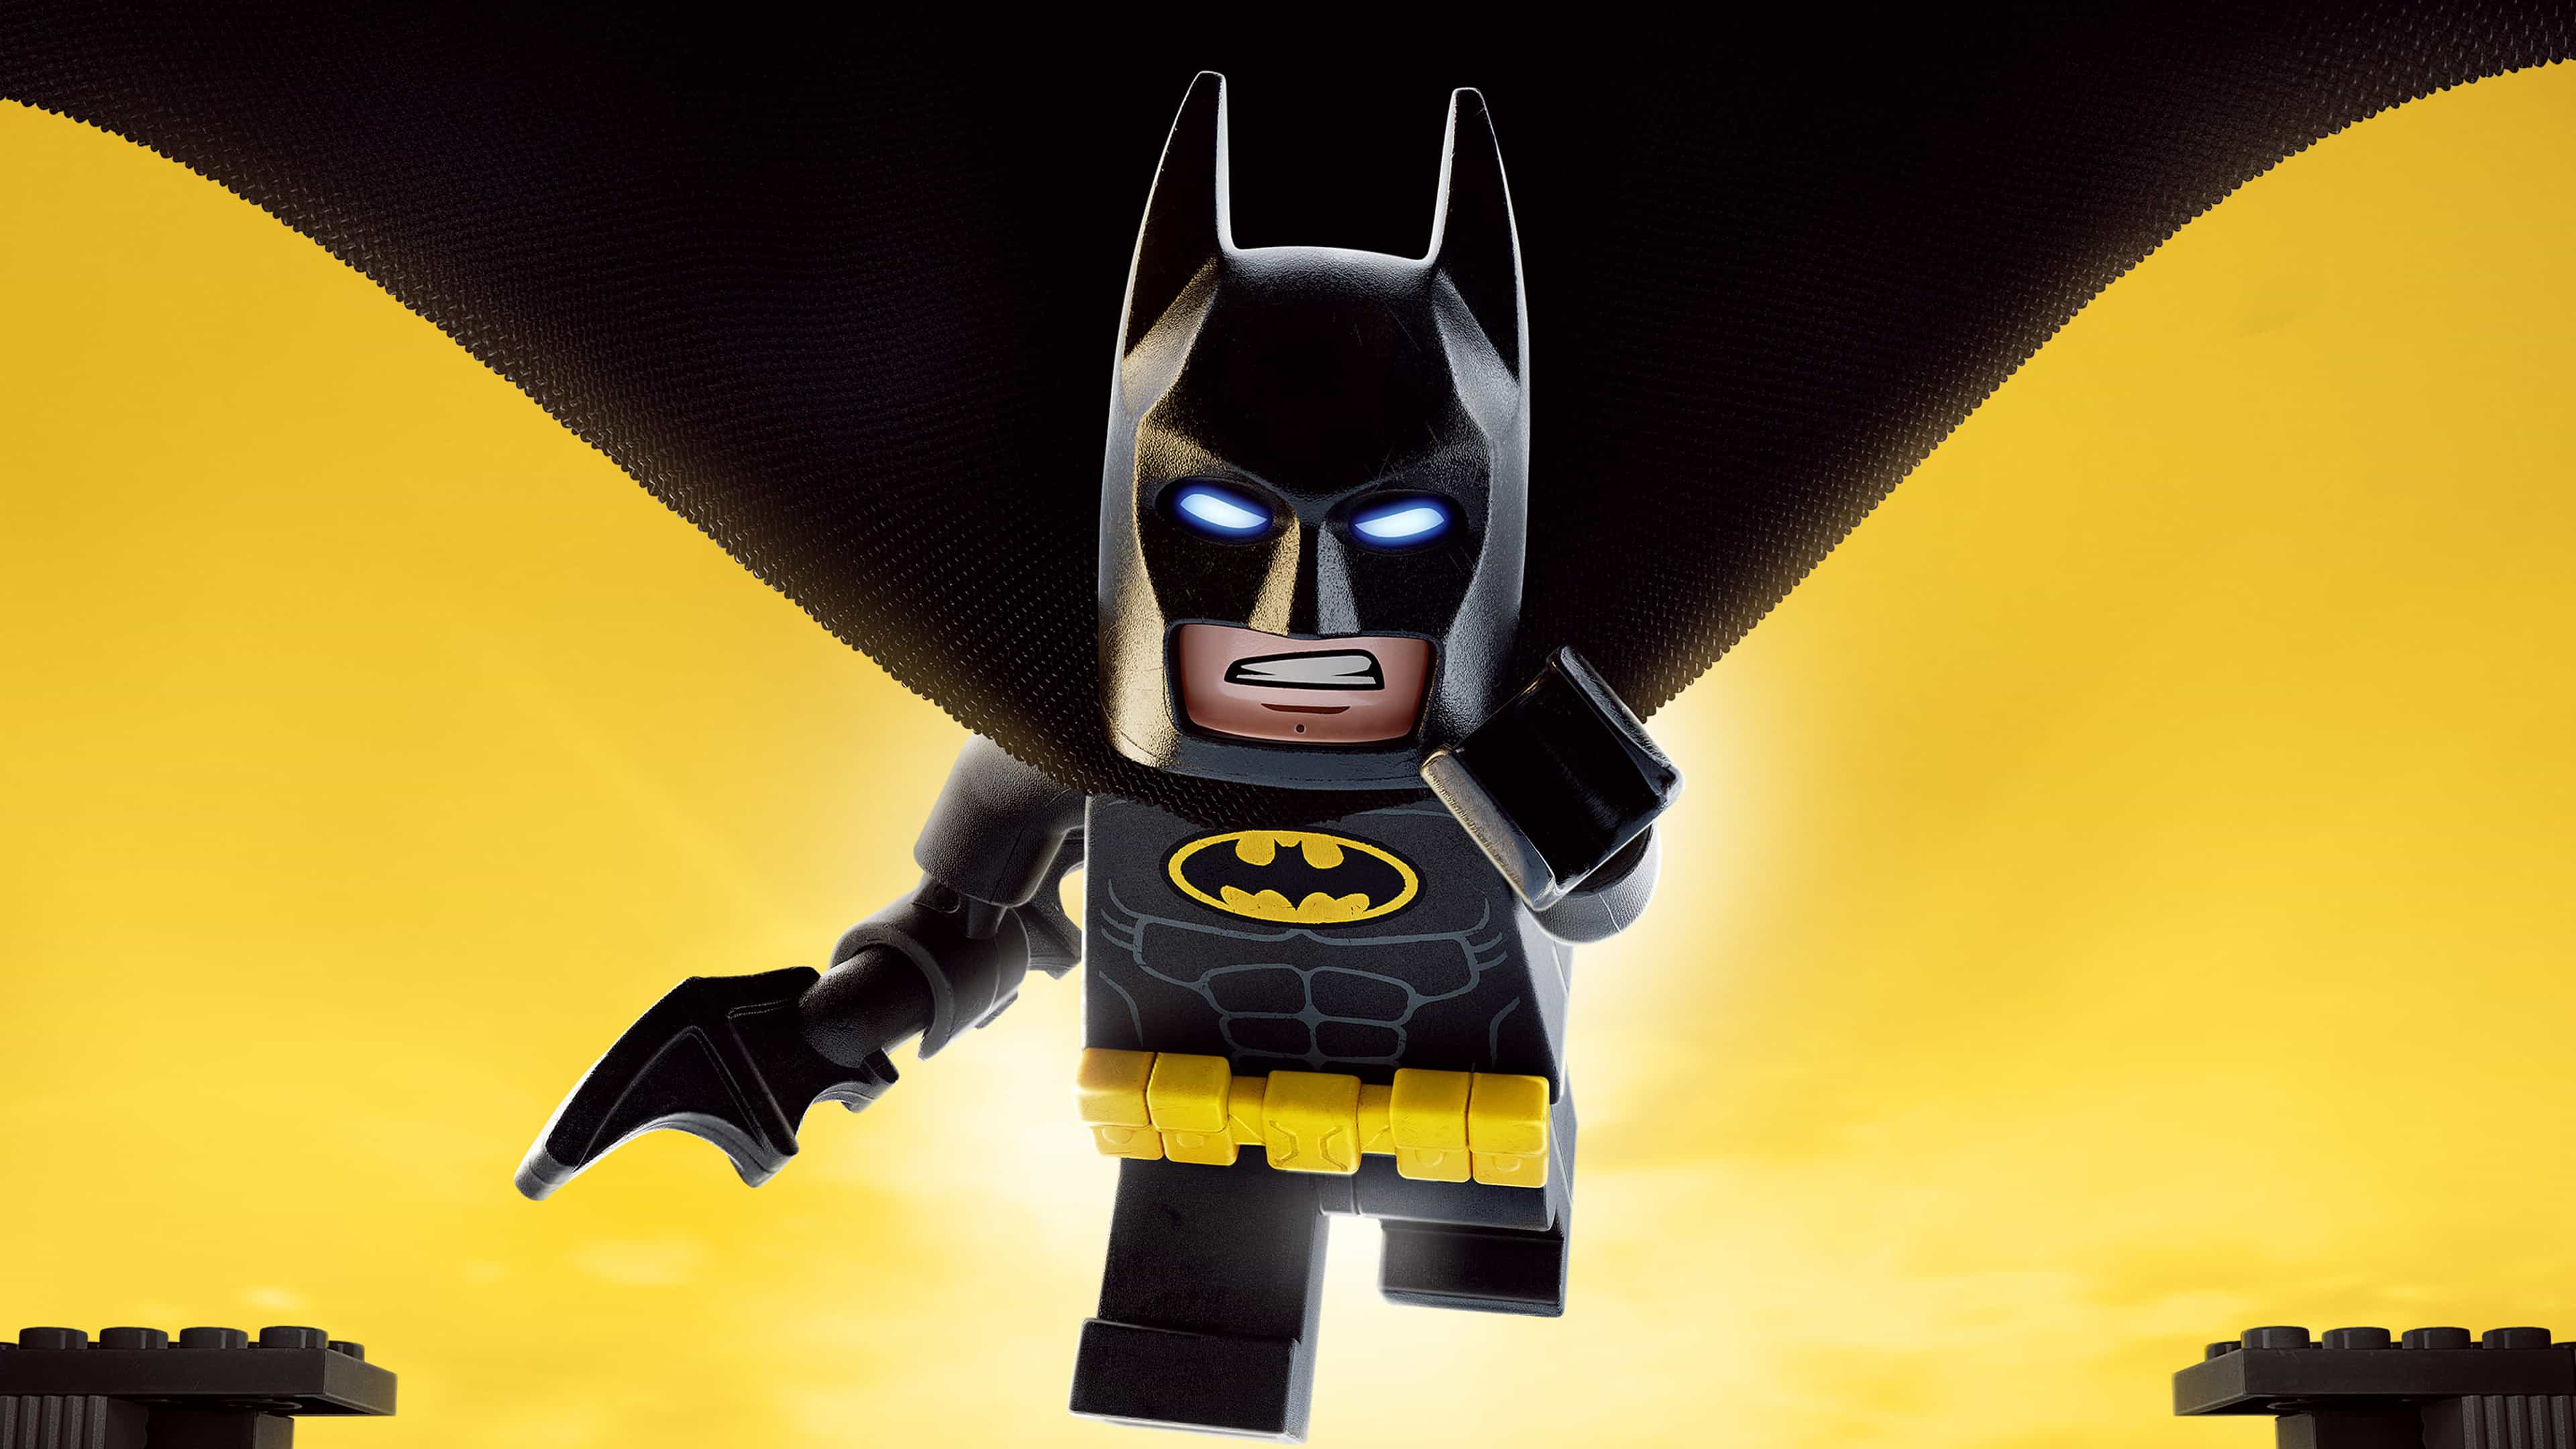 the lego batman movie batman uhd 4k wallpaper